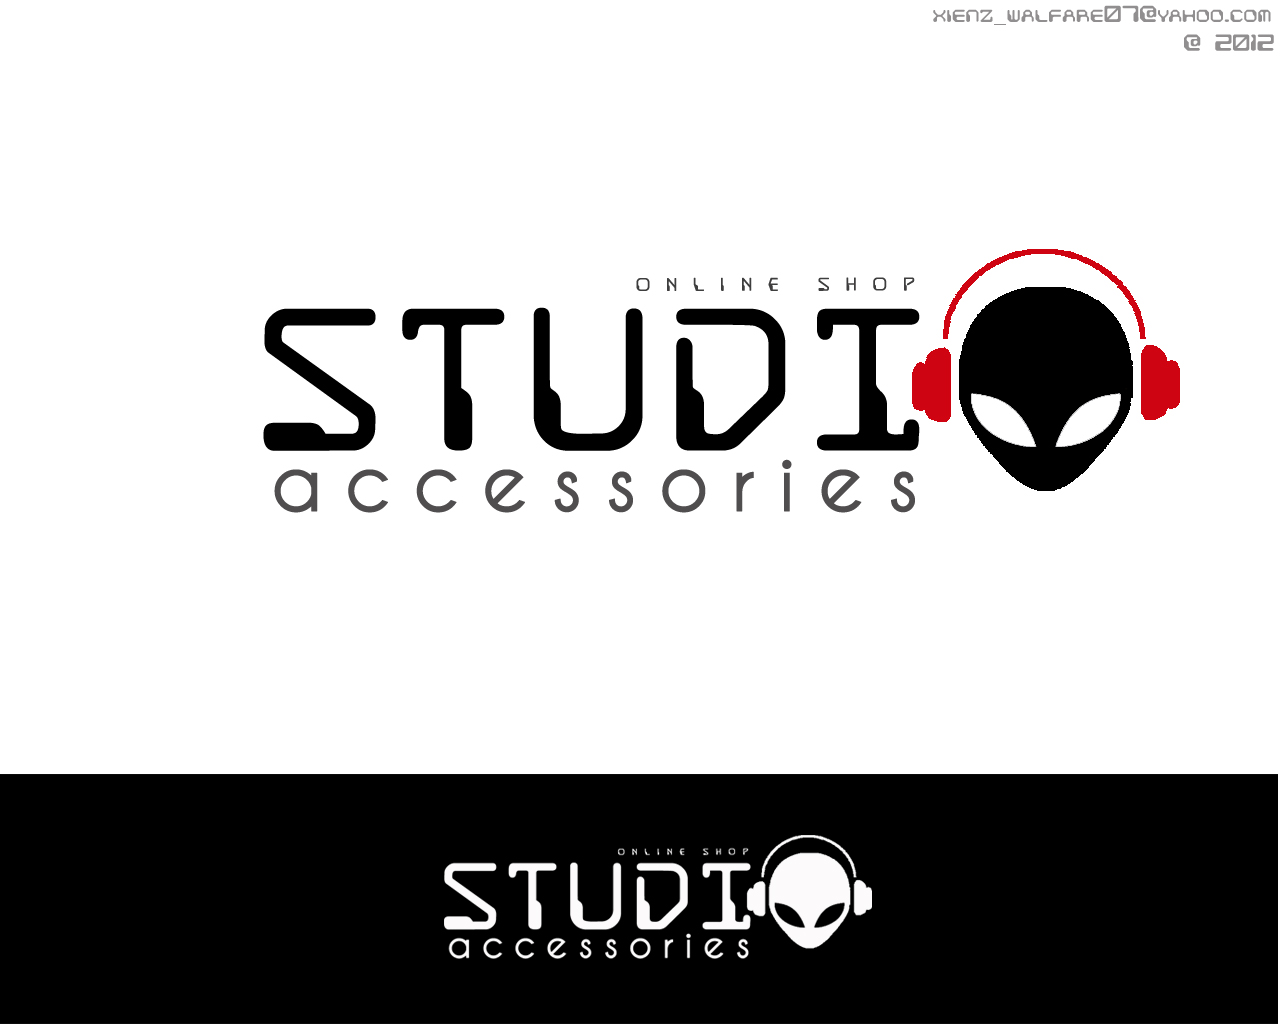 Studio Accessories by GuNnM21